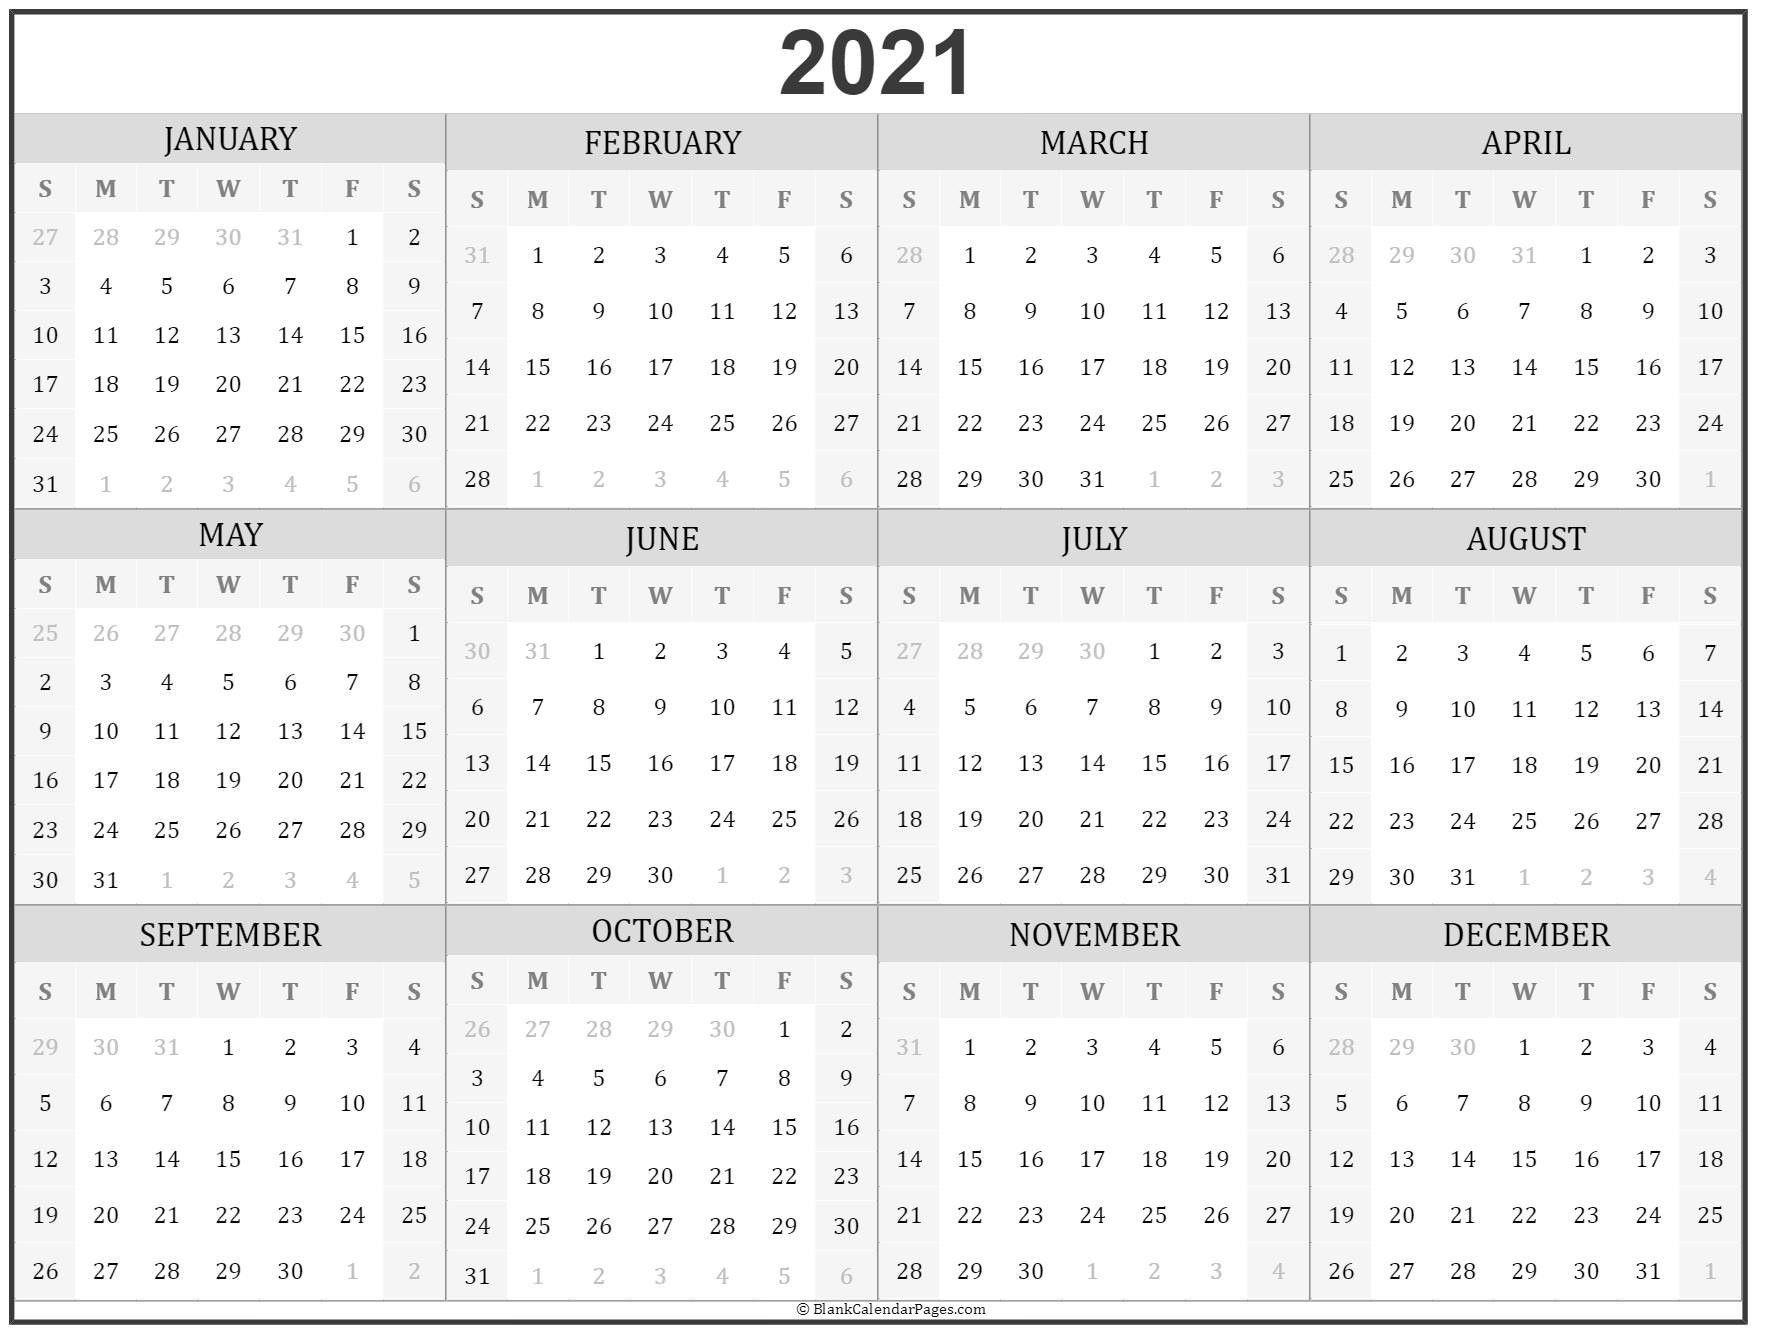 Microsoft Calendar Templates 2021 2 Page Per Month in Free Fillable Calendar 2021